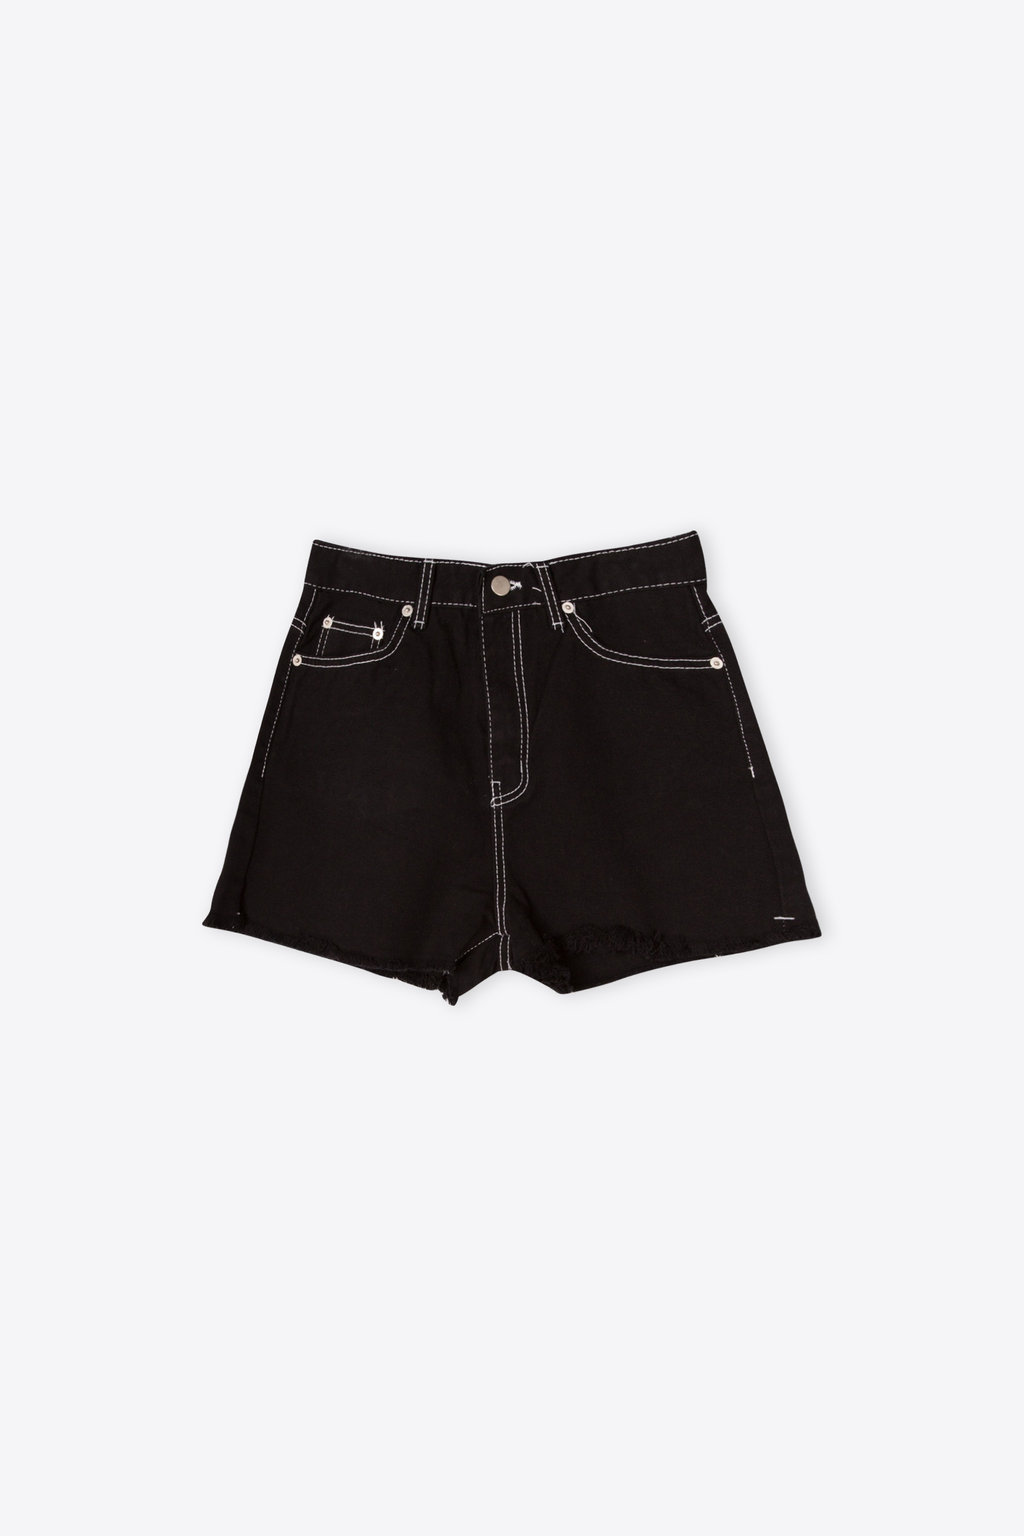 Short H052 Black 5